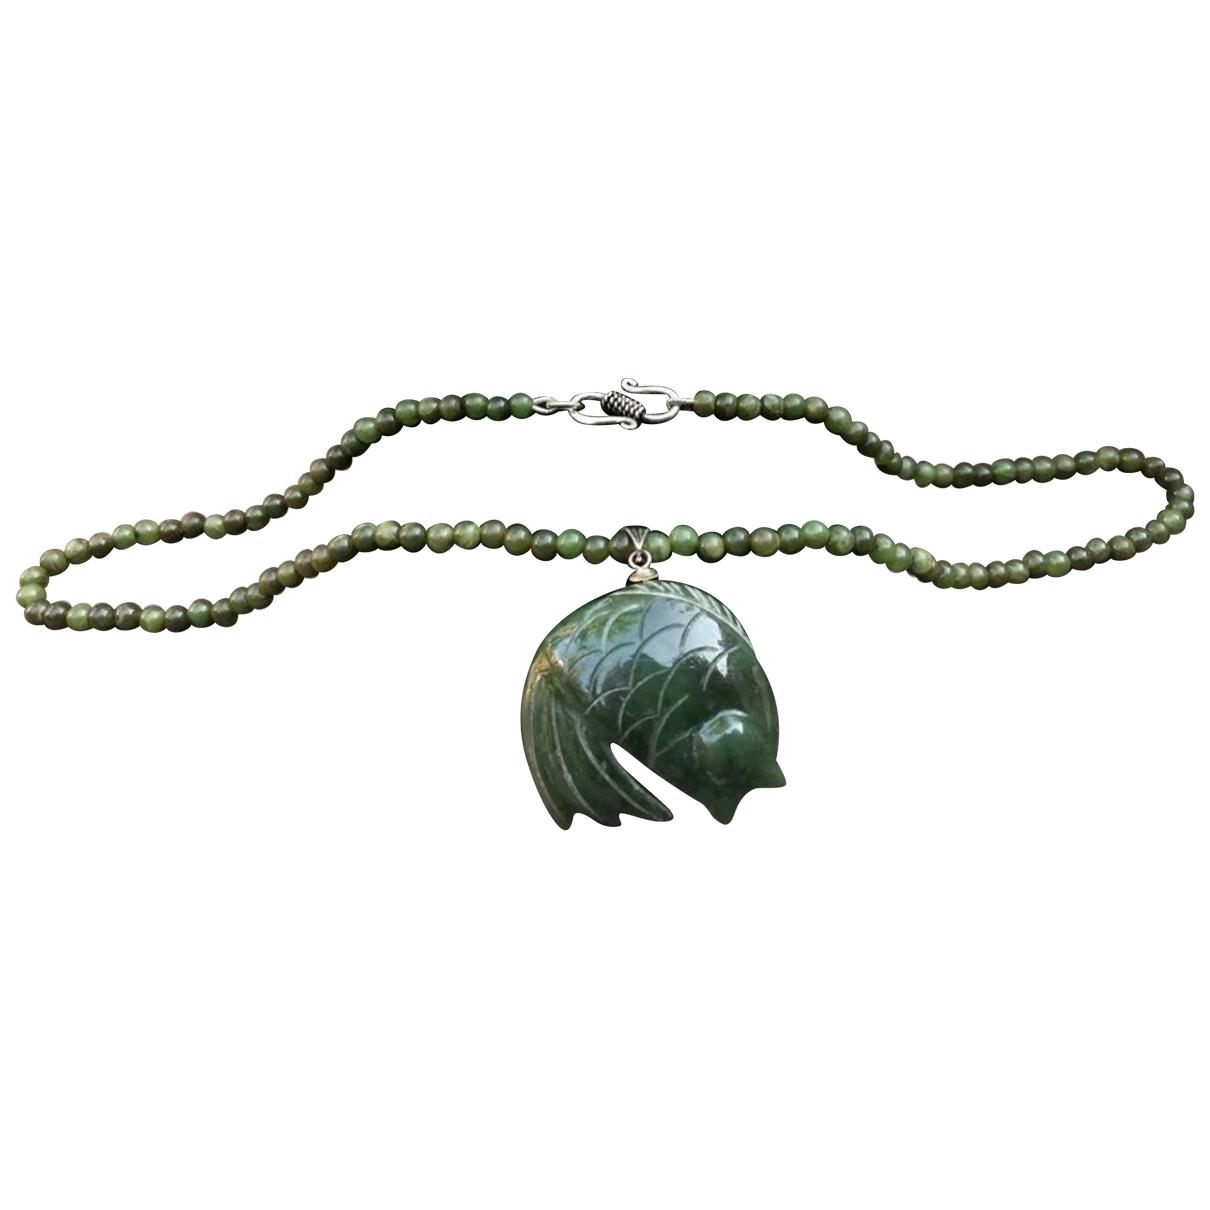 Non Signe / Unsigned Motifs Animaliers Kette in  Gruen Jade